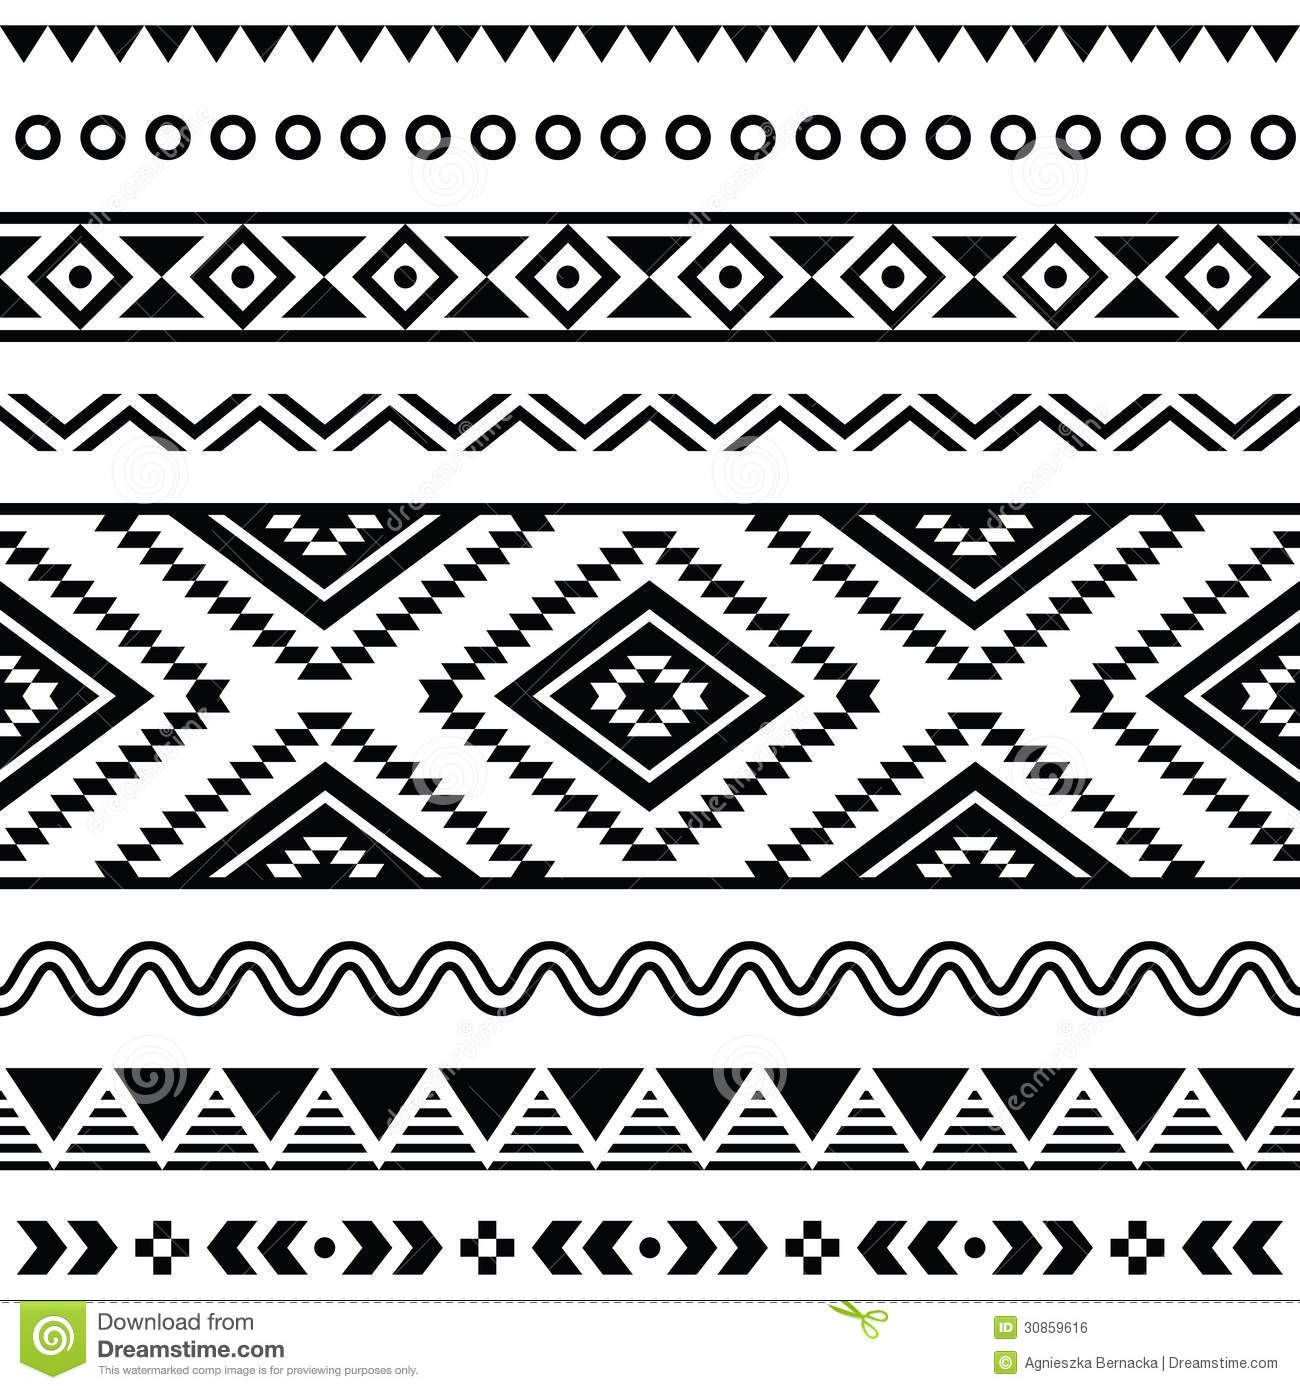 Aztec Warrior clipart border Background images Ztec Aztec Seamless